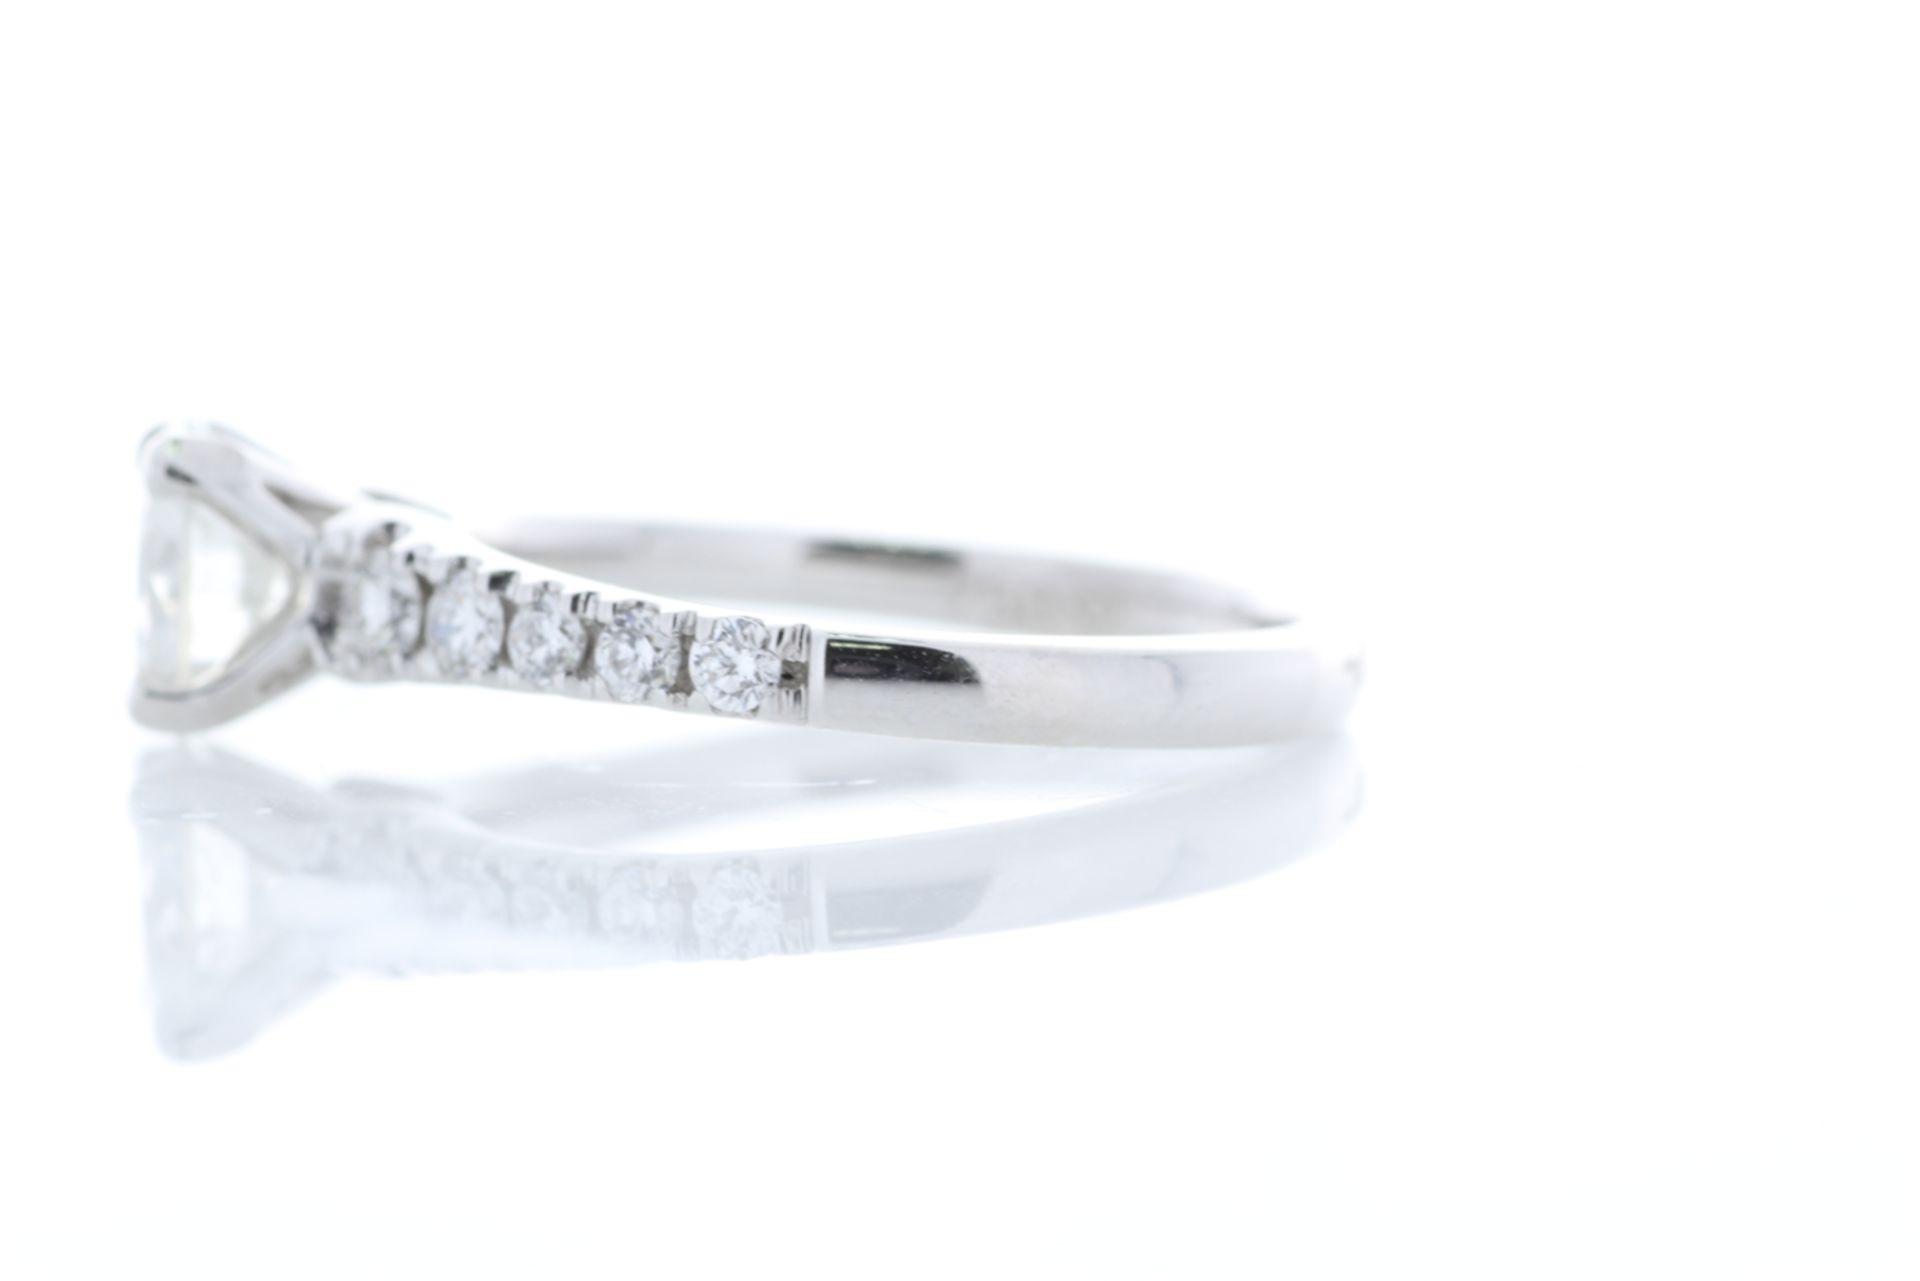 Lot 26 - 18k White Gold Single Stone Prong Set With Stone Set Shoulders Diamond Ring (0.91) 1.22